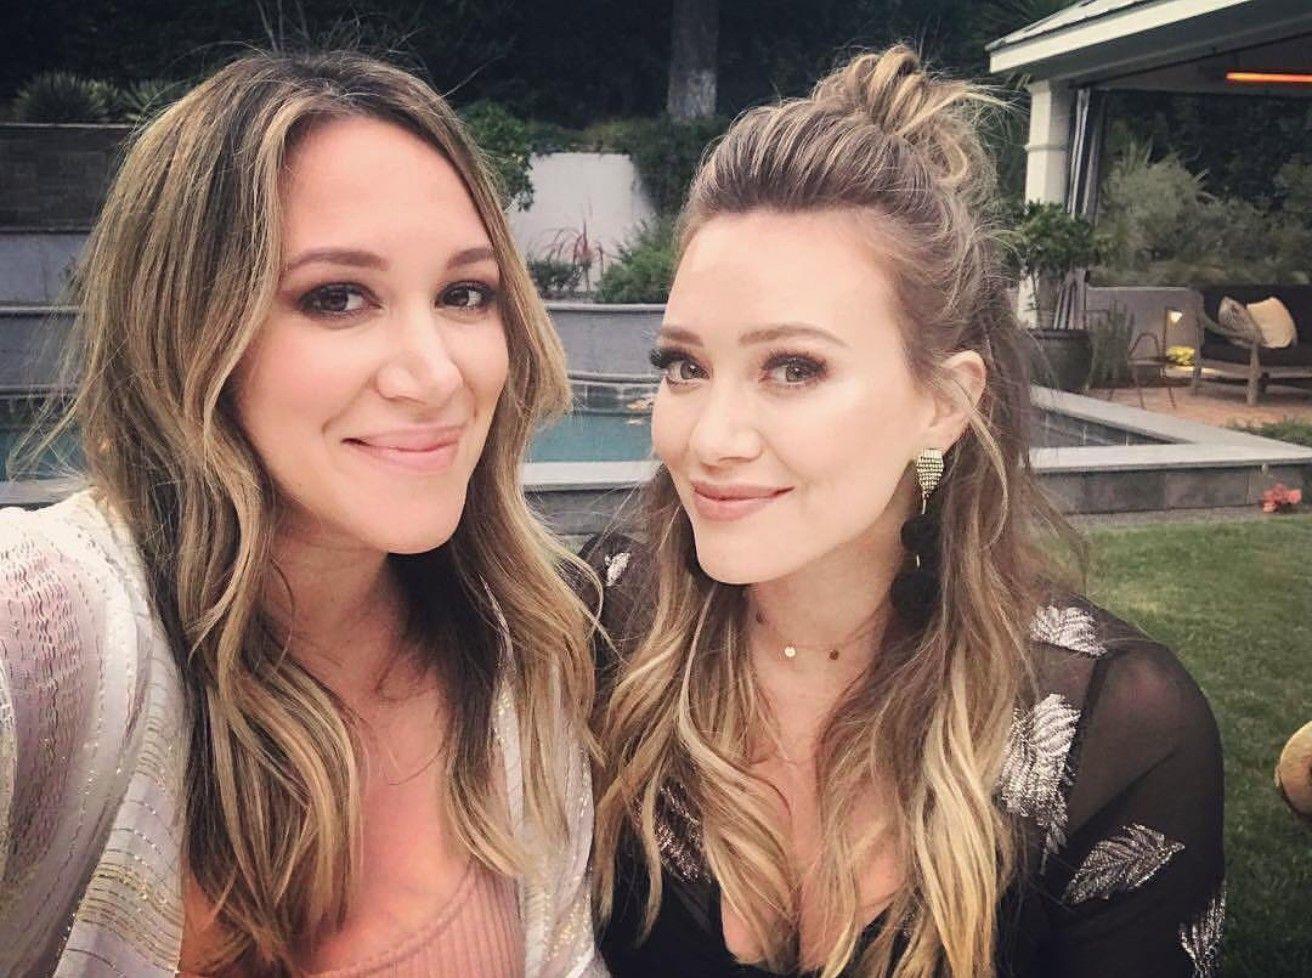 Hilary Duff And Sister Hilary Duff Hair Haylie Duff The Duff